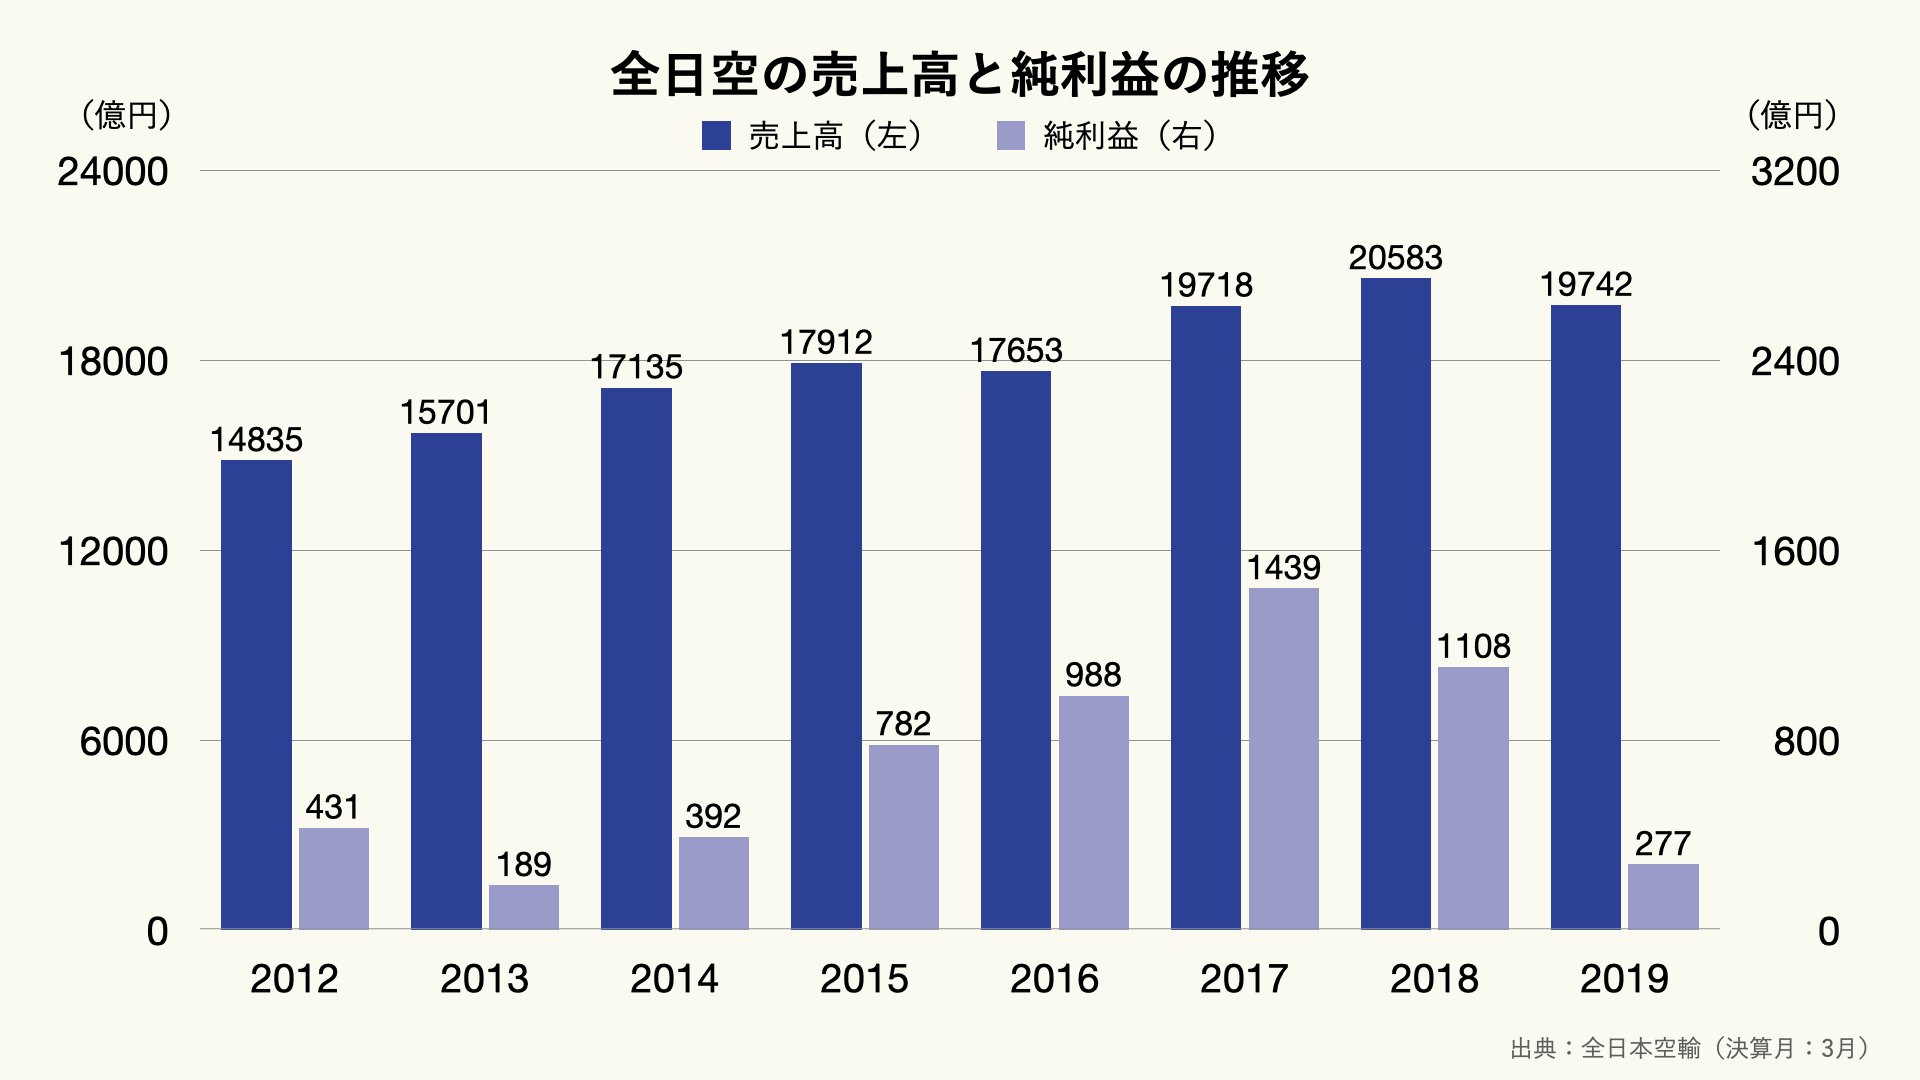 ANA(全日空)の売上高と純利益の推移のグラフ